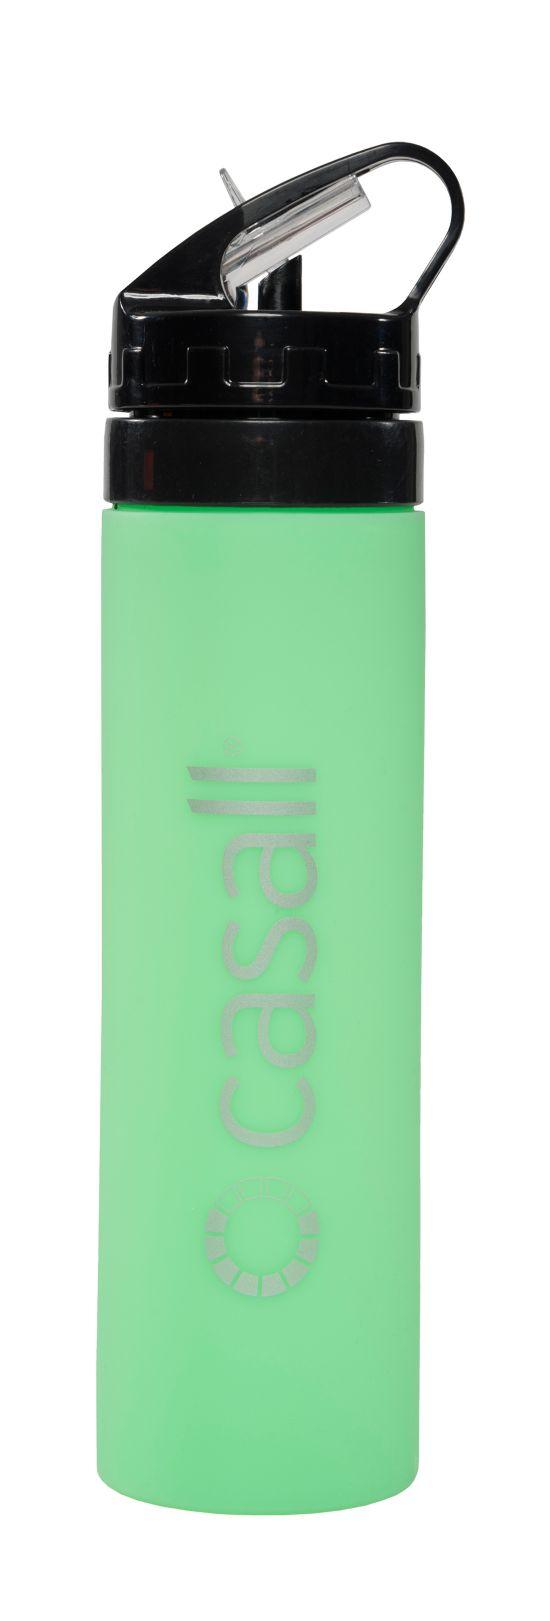 Soft Vannflaske 0,6L